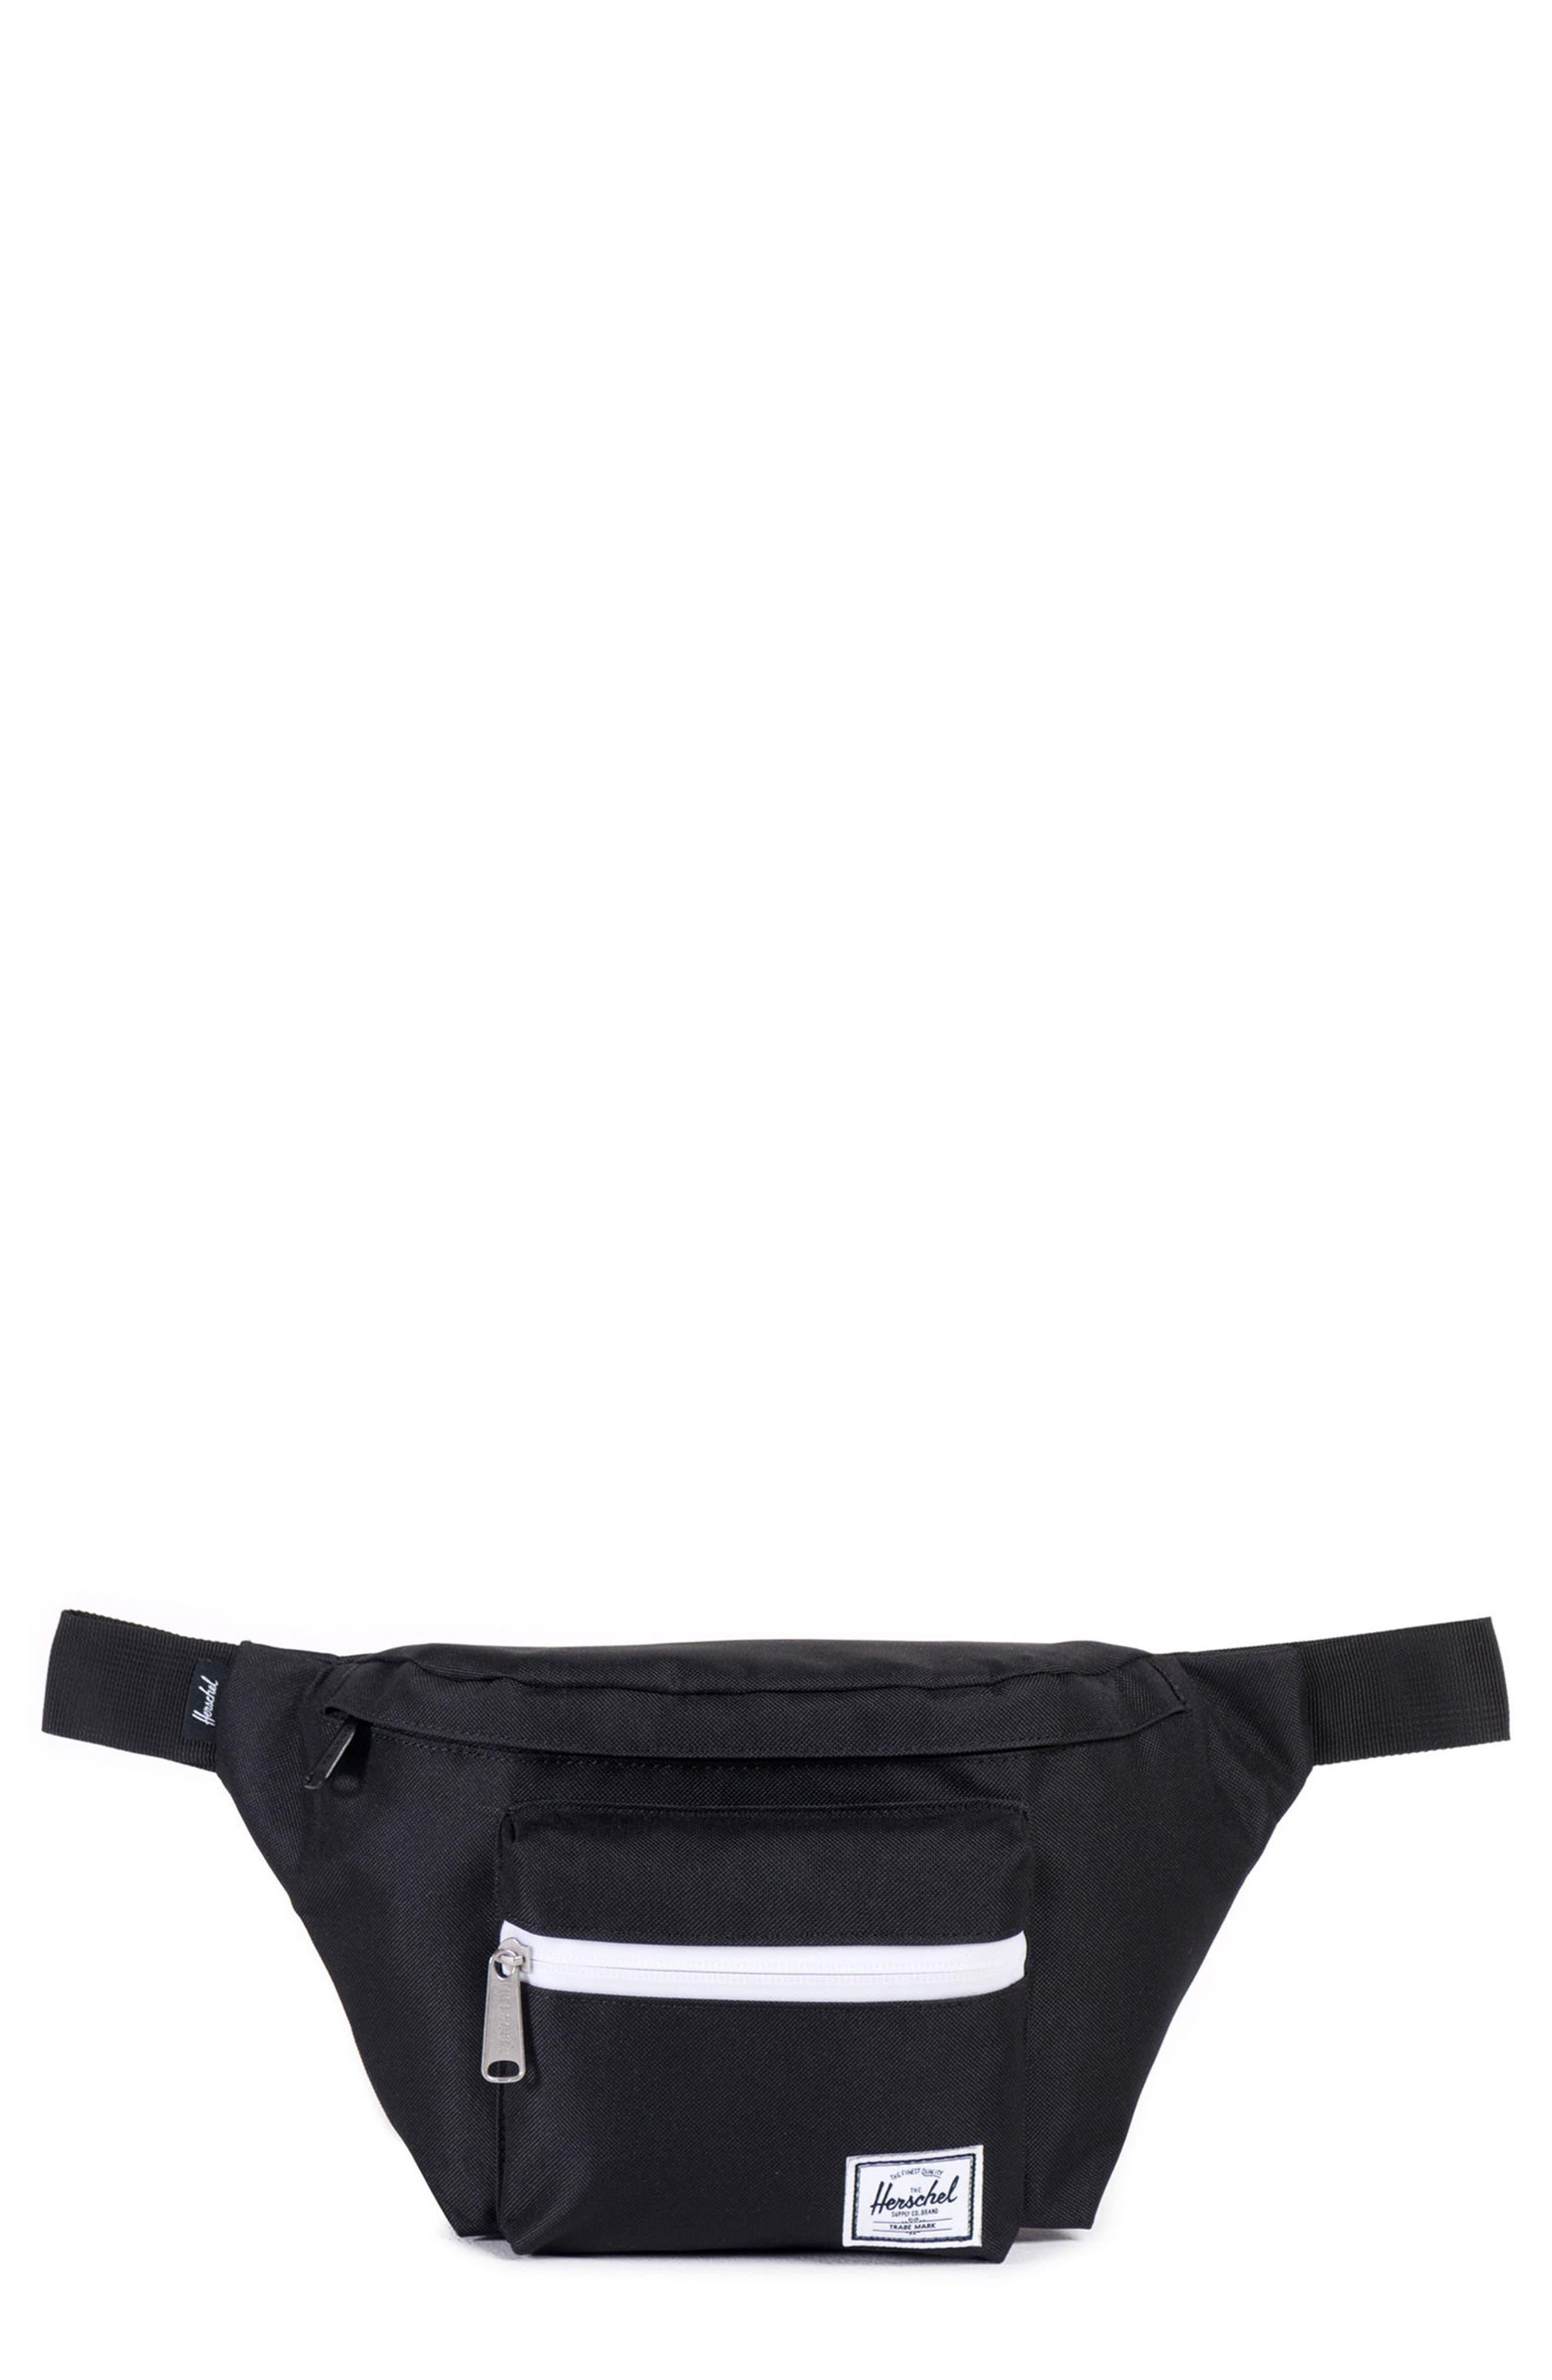 'Seventeen' Belt Bag,                         Main,                         color, Black